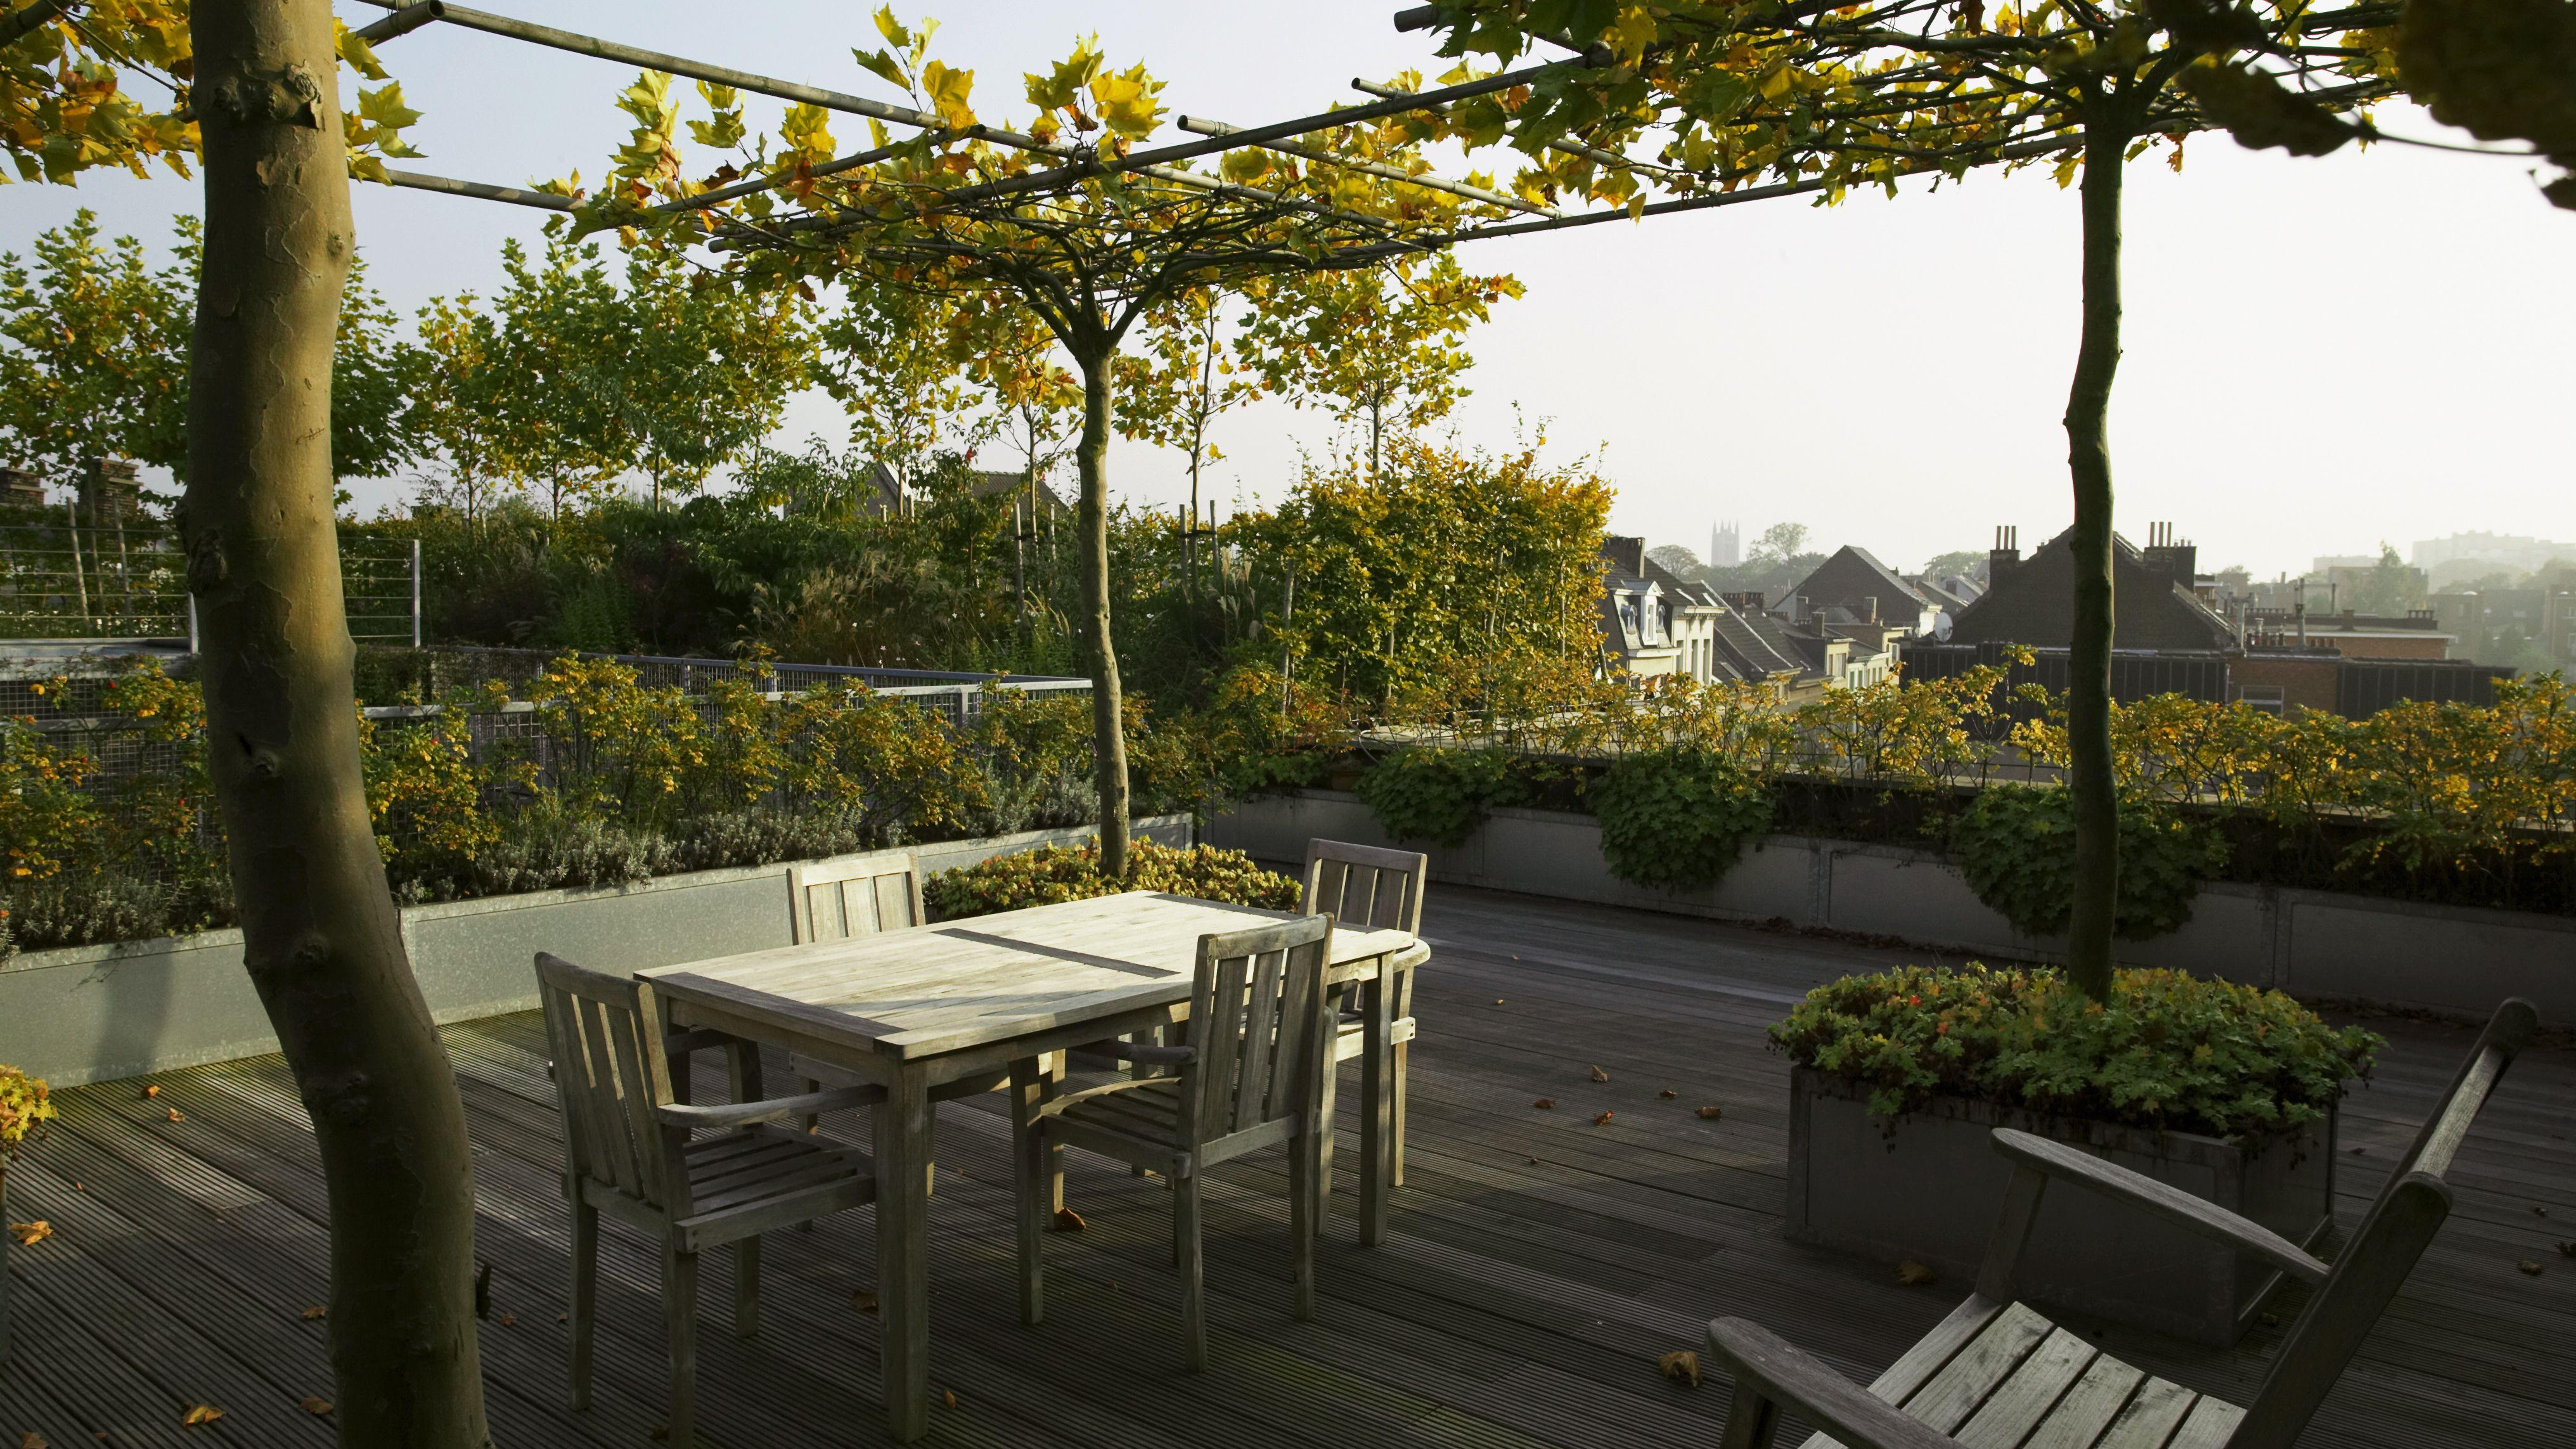 How To Create An Urban Rooftop Garden